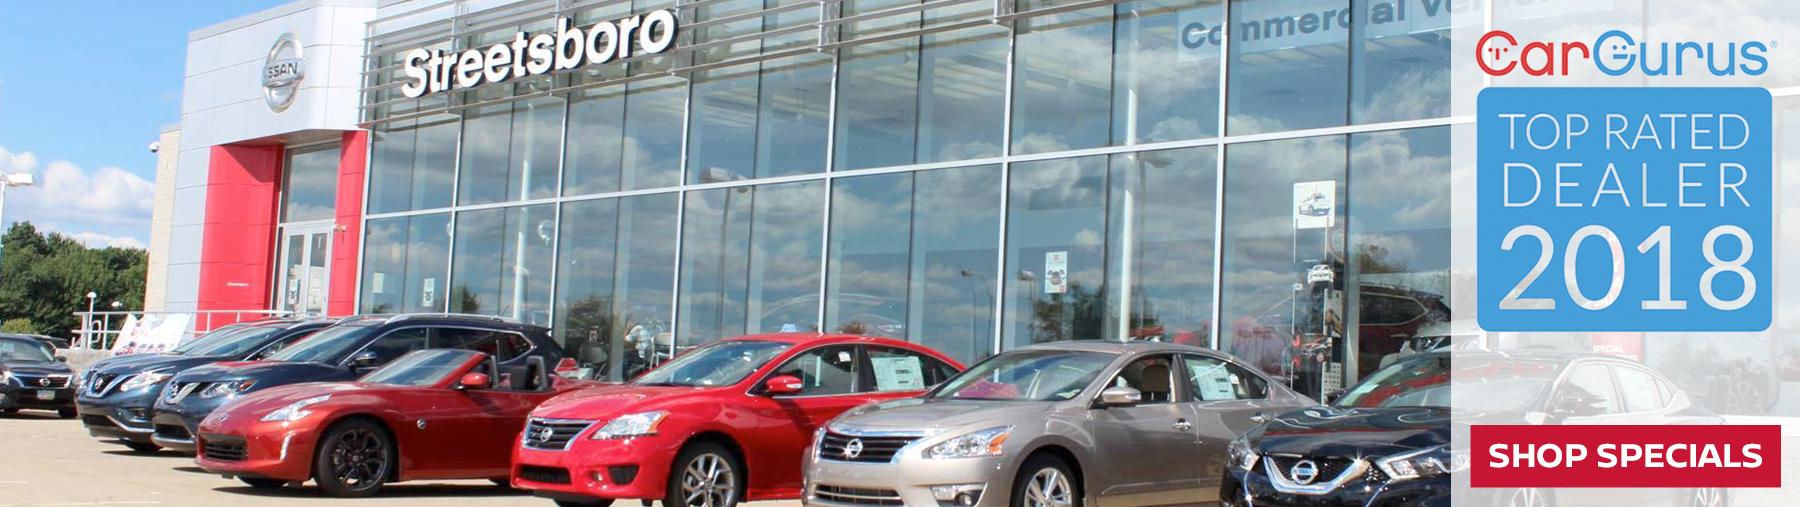 Nissan Of Streetsboro >> Nissan Of Streetsboro New Used Dealership Streetsboro Oh